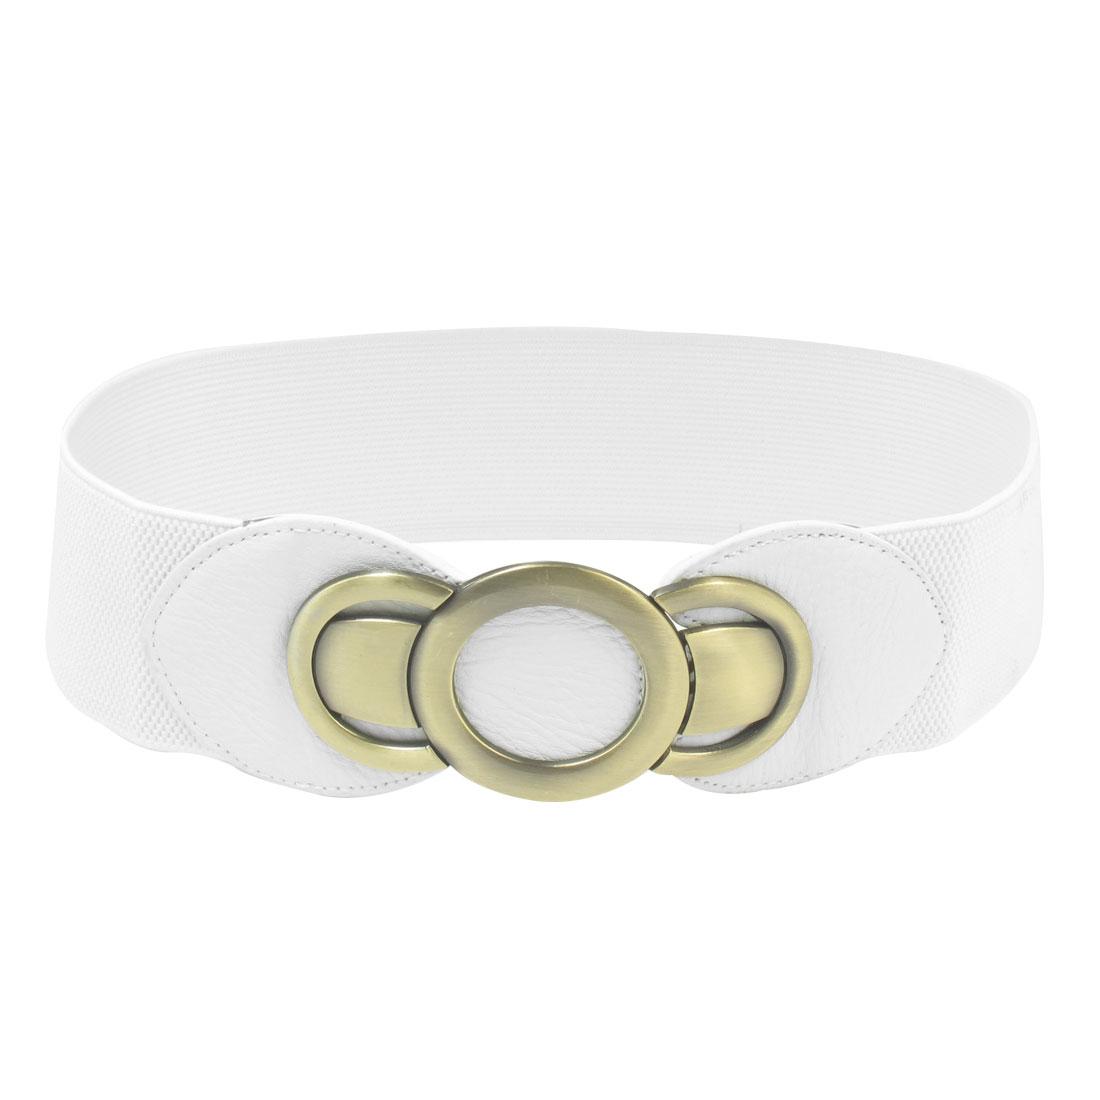 Strechy Metal Interlocking Buckle Accent Wide Waist Belt Cinch for Lady White